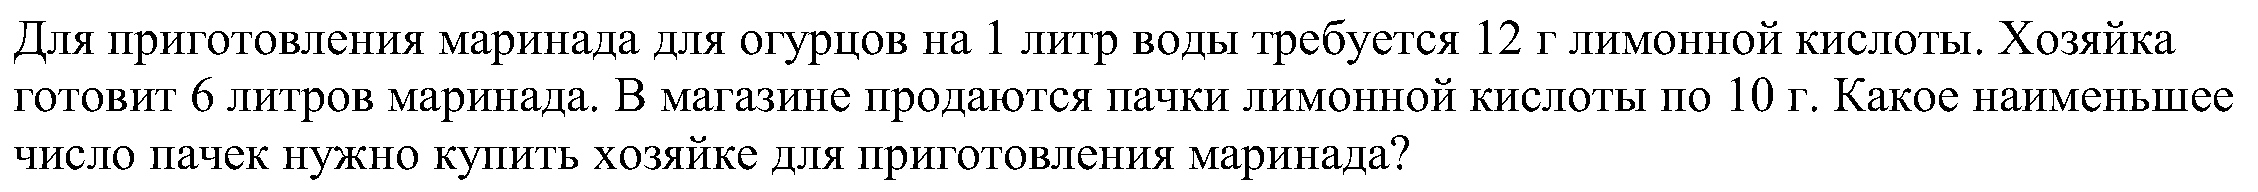 hello_html_4537dba.png